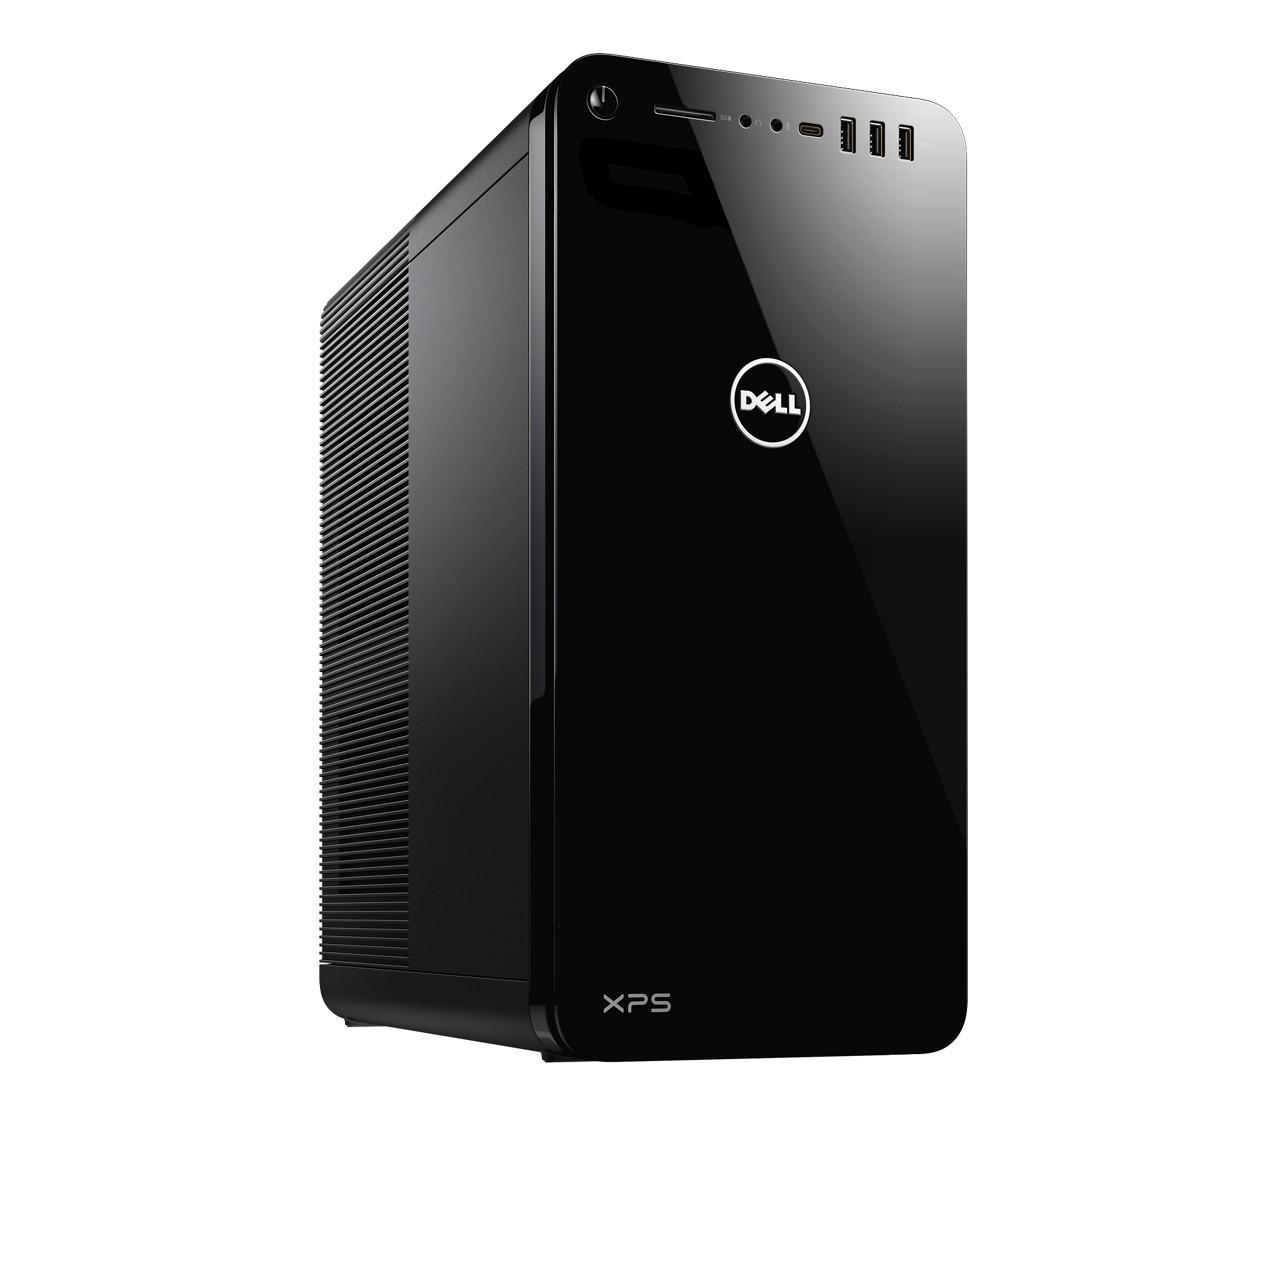 Dell XPS Desktop Black Tower- Intel i3-8100 4-Core- 1TB HDD- 8GB RAM